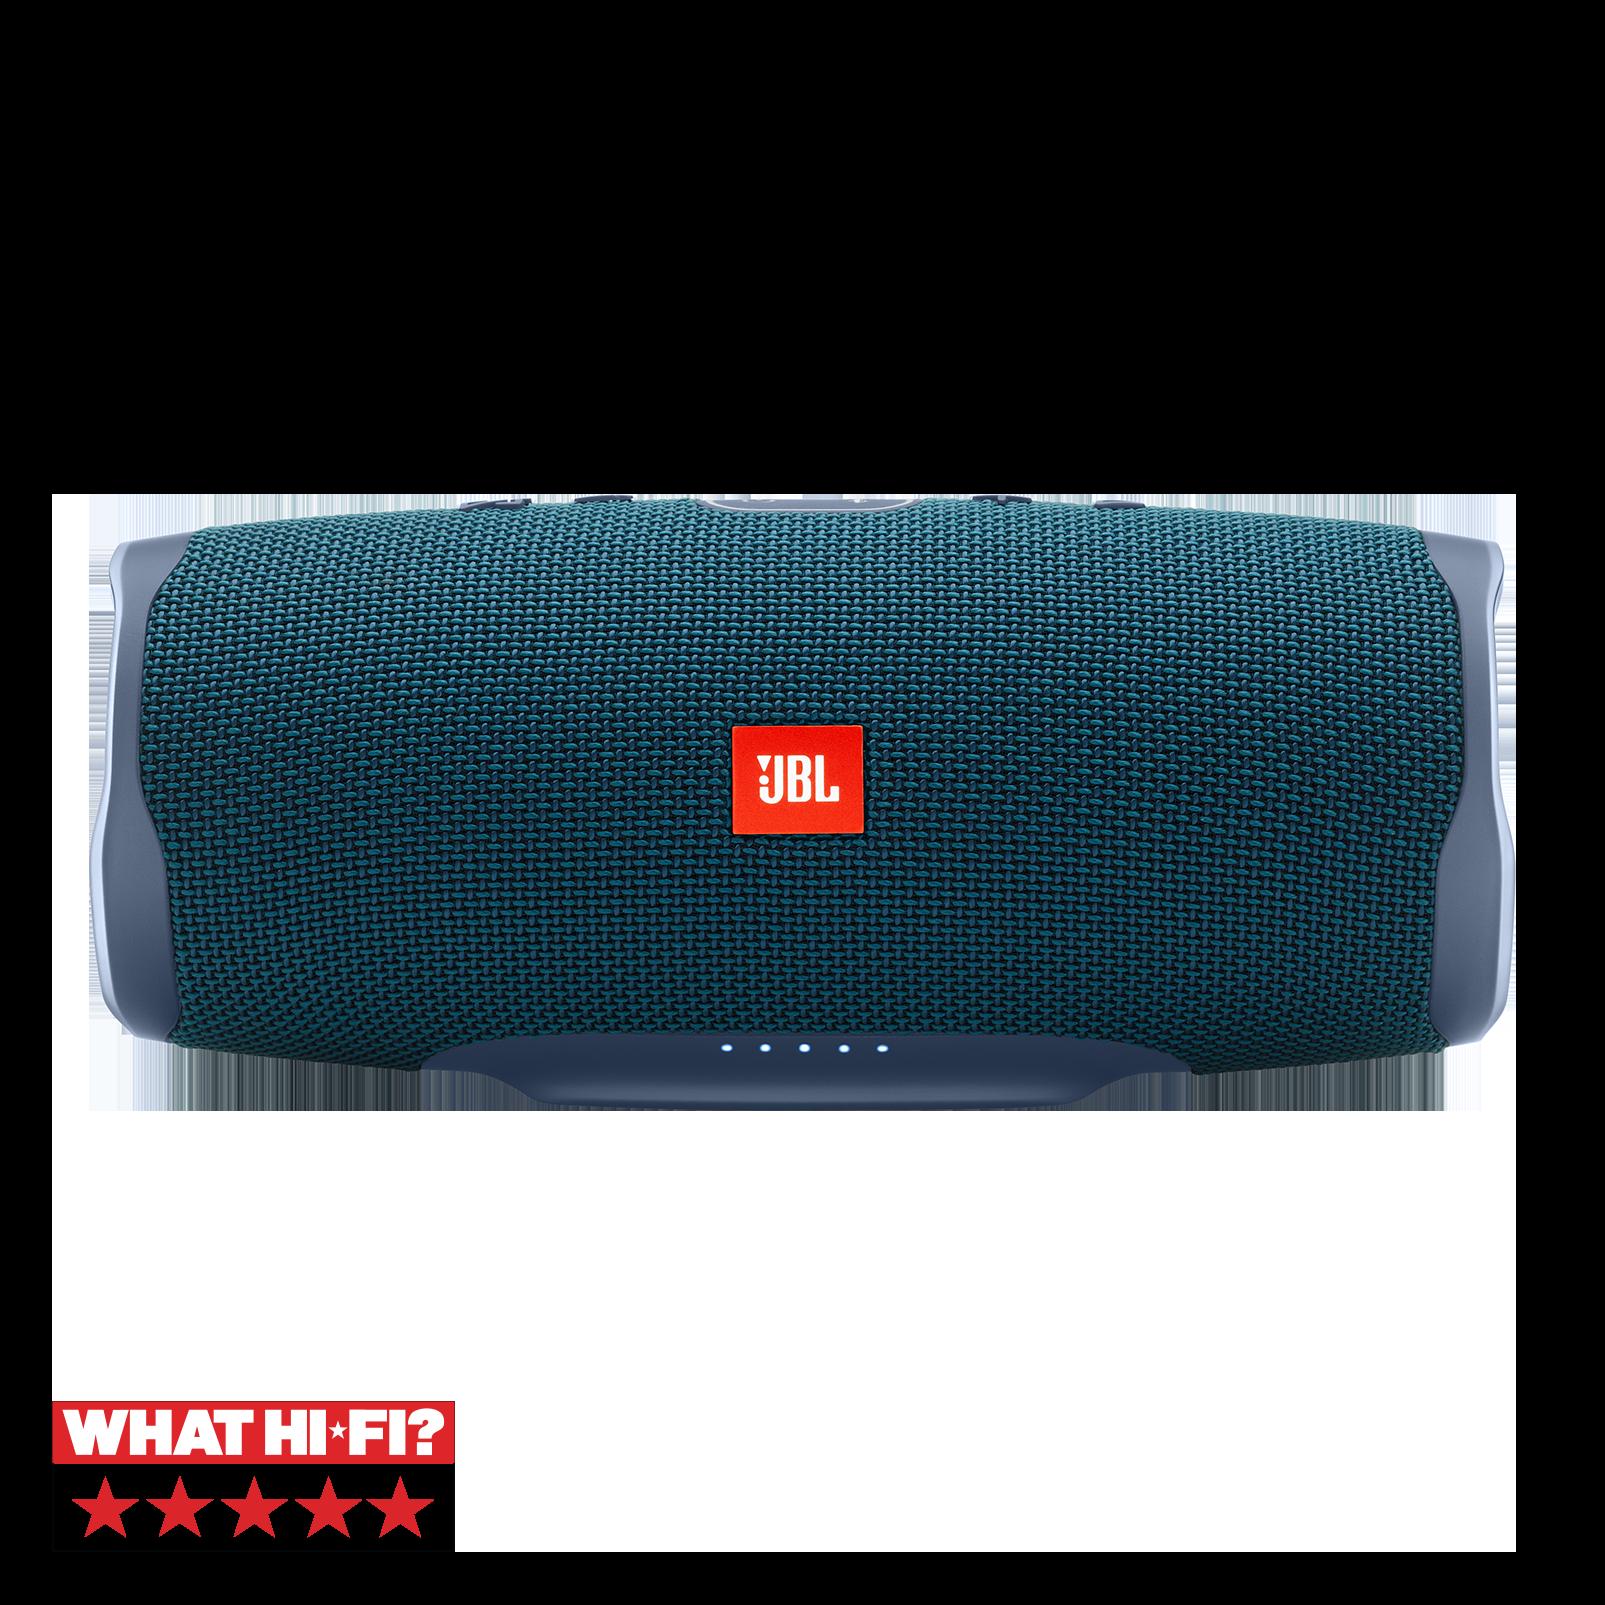 JBL Charge 4 - Blue - Portable Bluetooth speaker - Hero